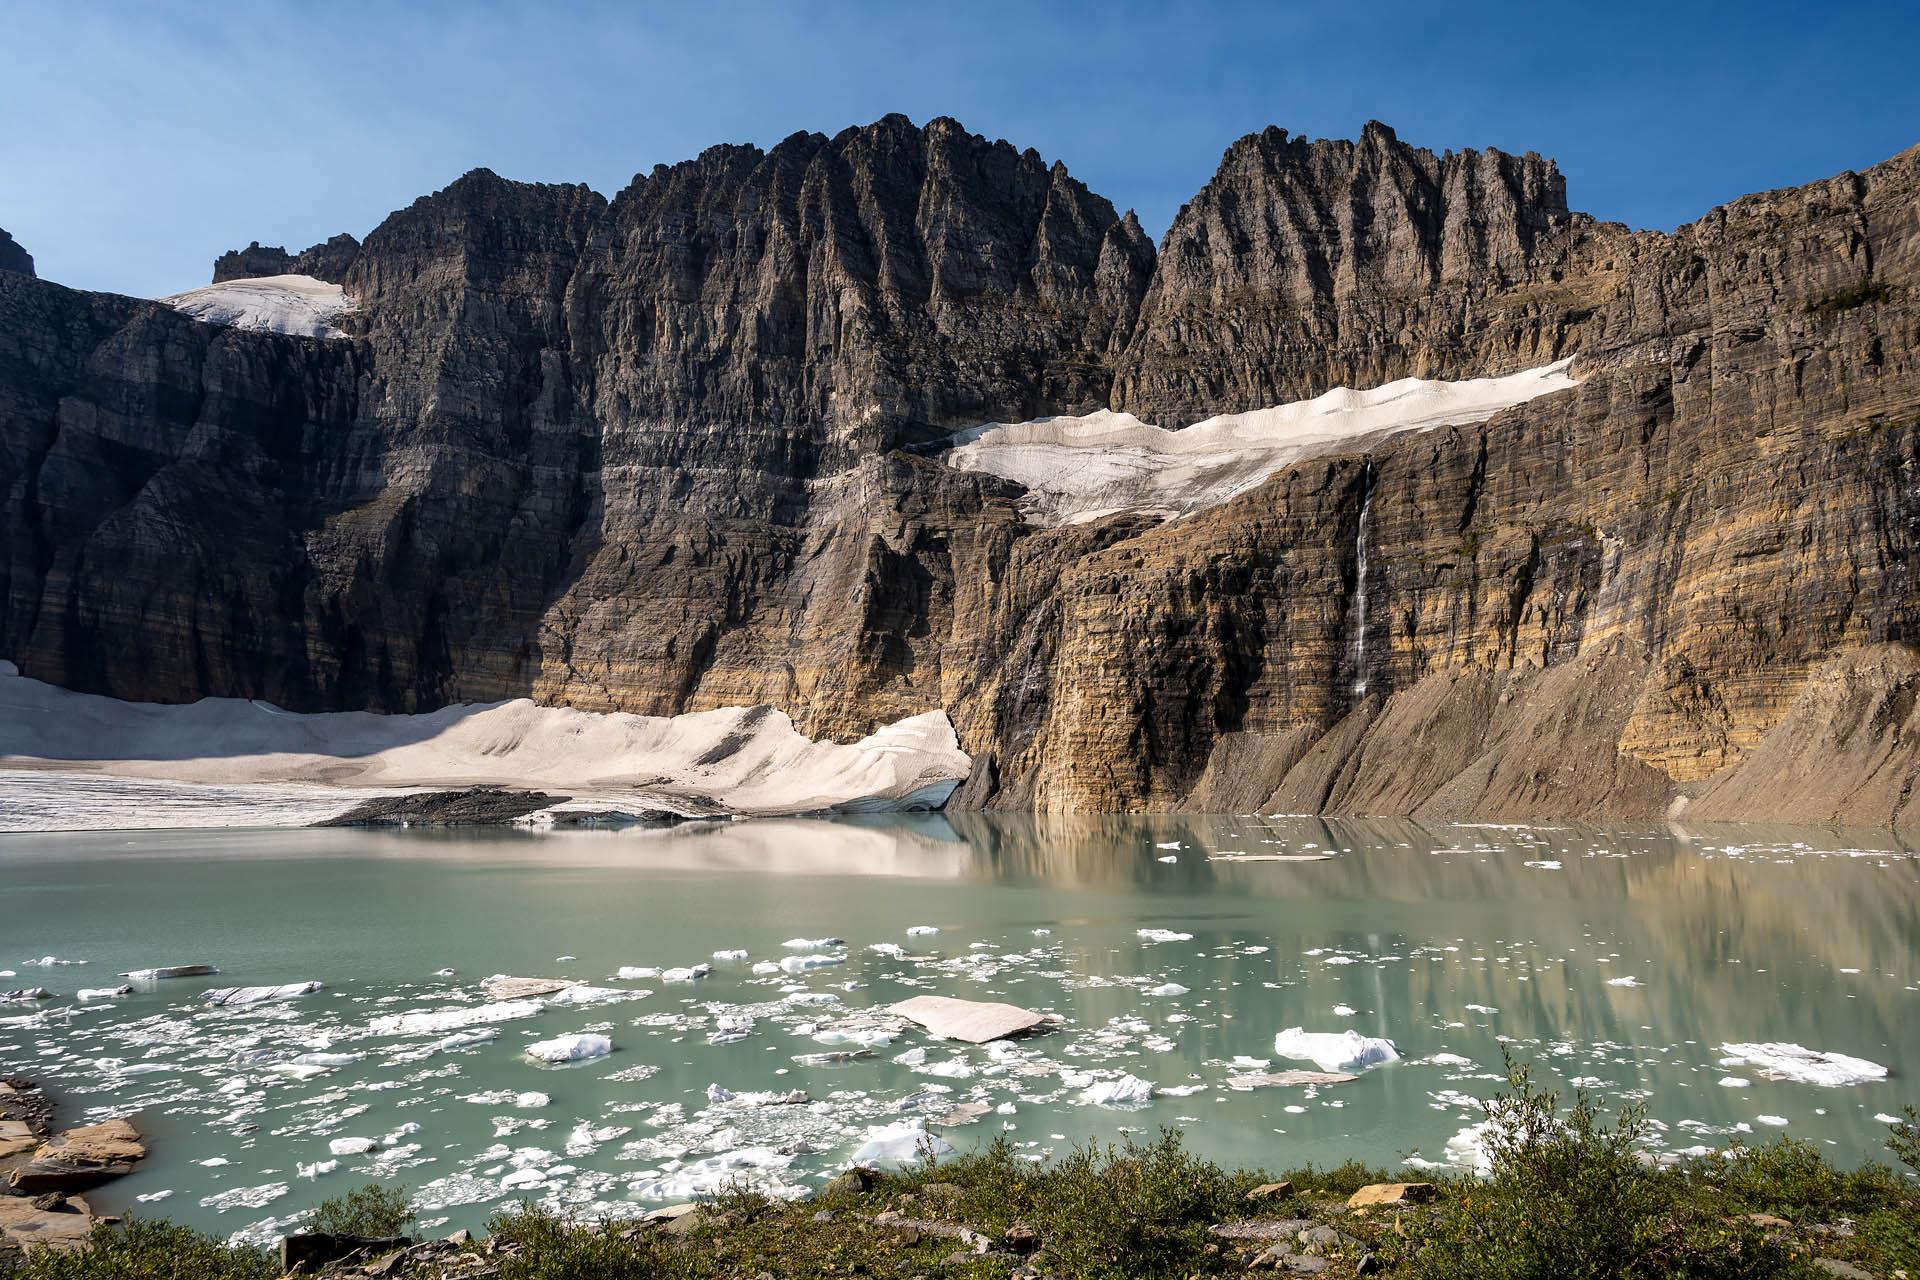 Upper Grinnell Lake, Salamander Falls, Salamander Glacier